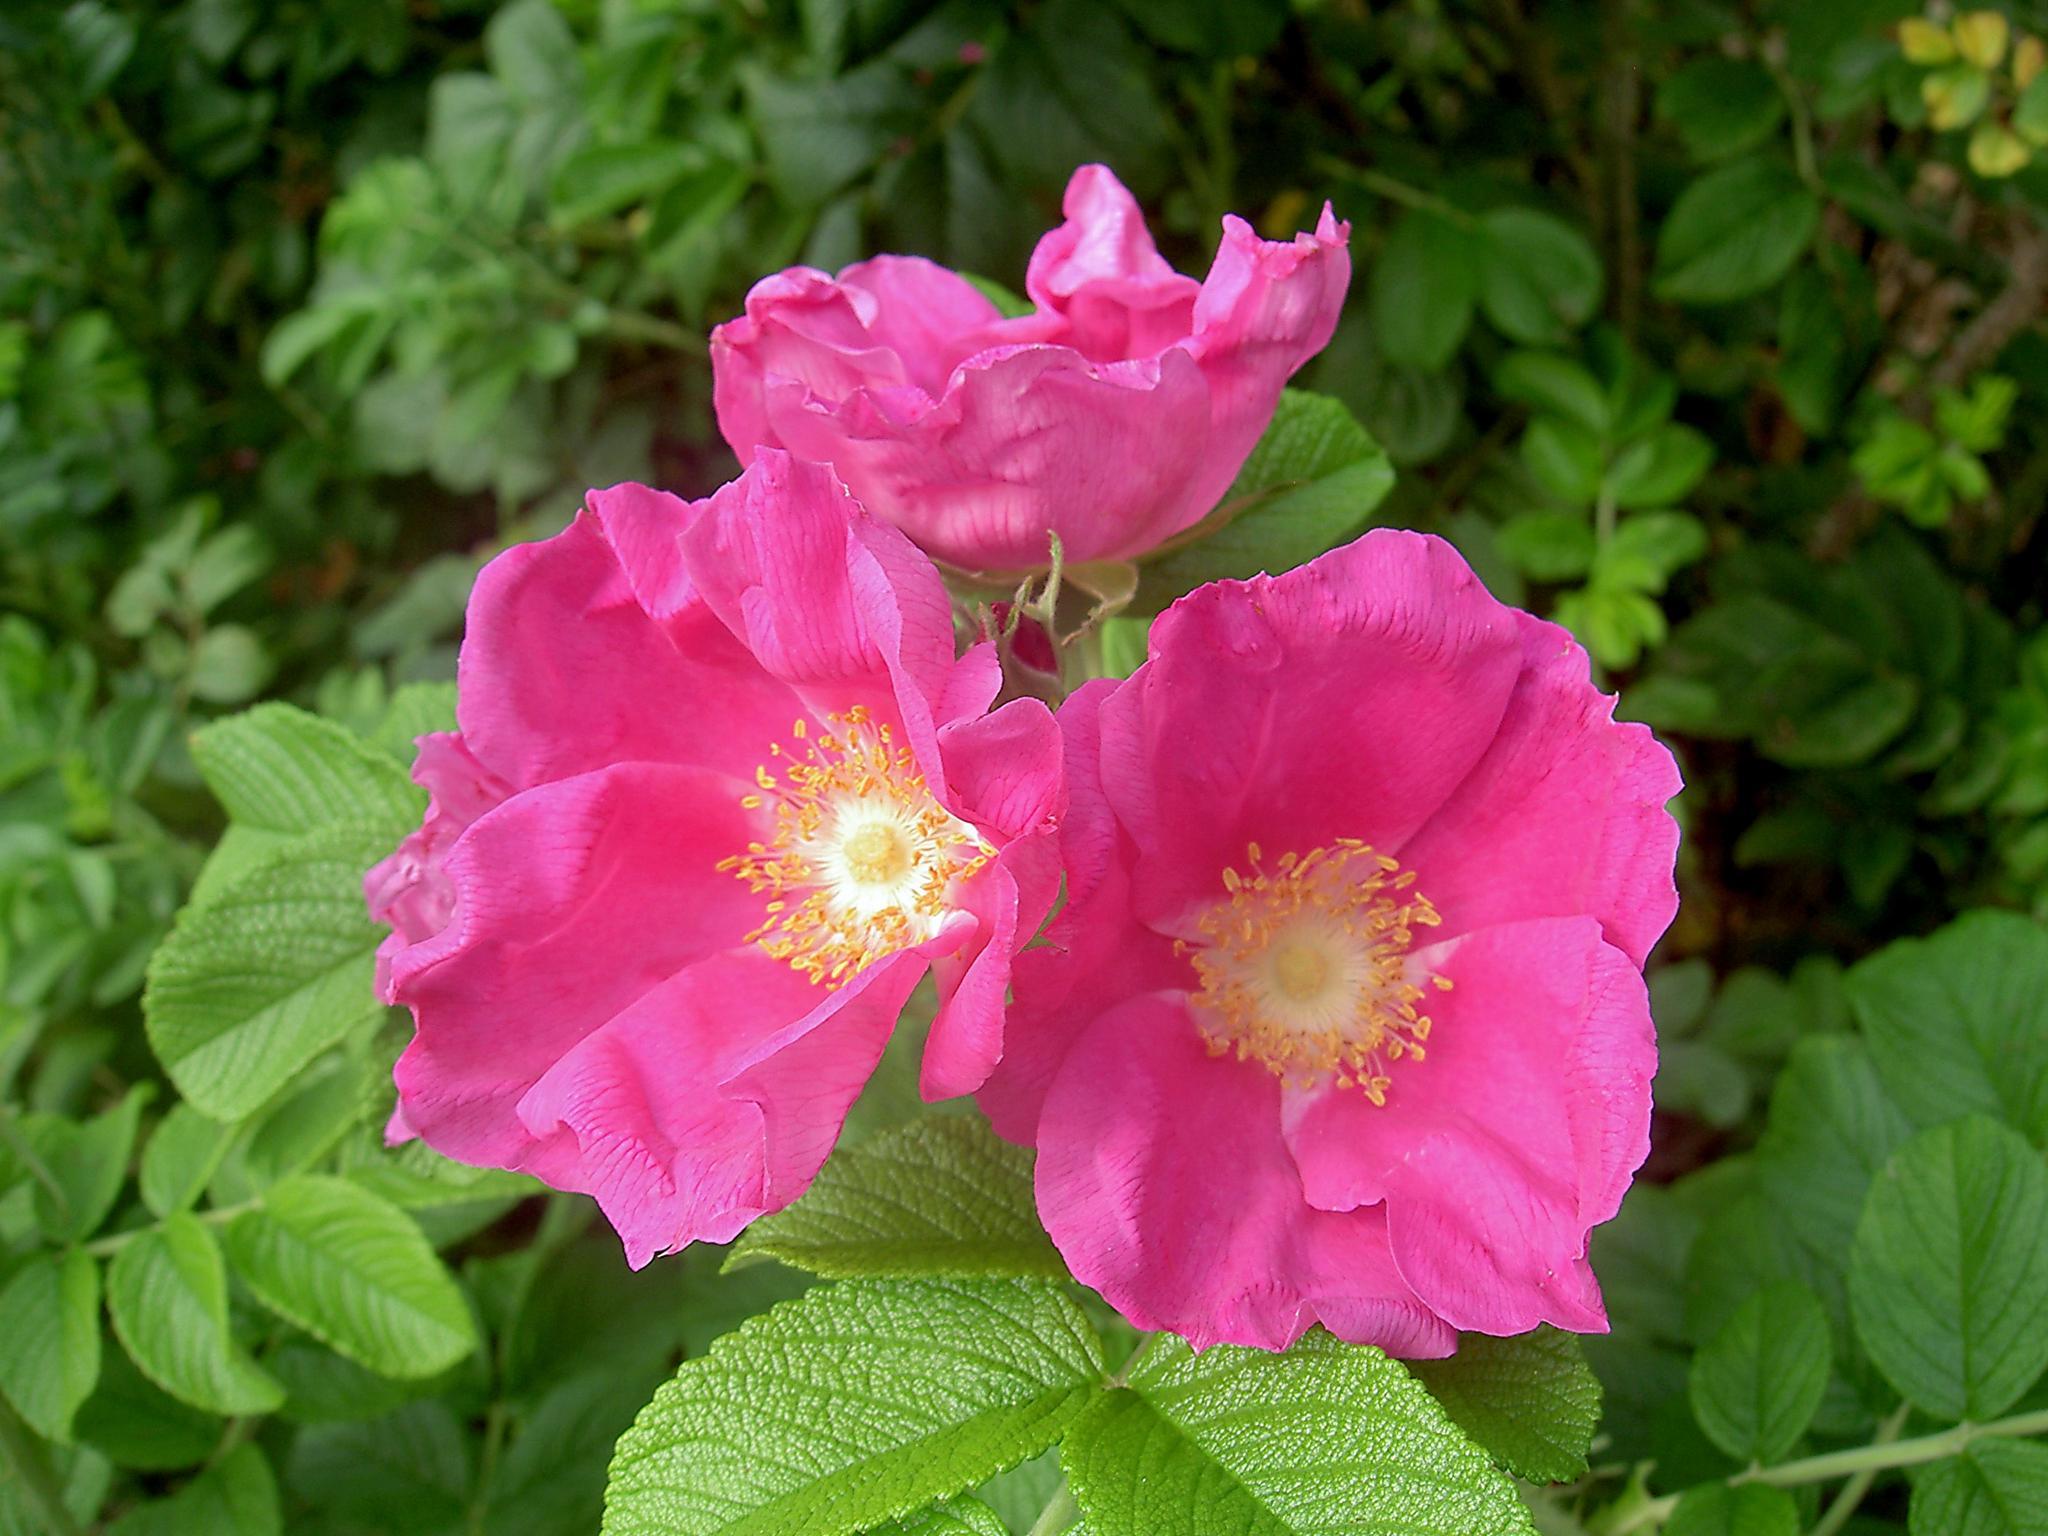 Wild Roses by Terri Scache Harris